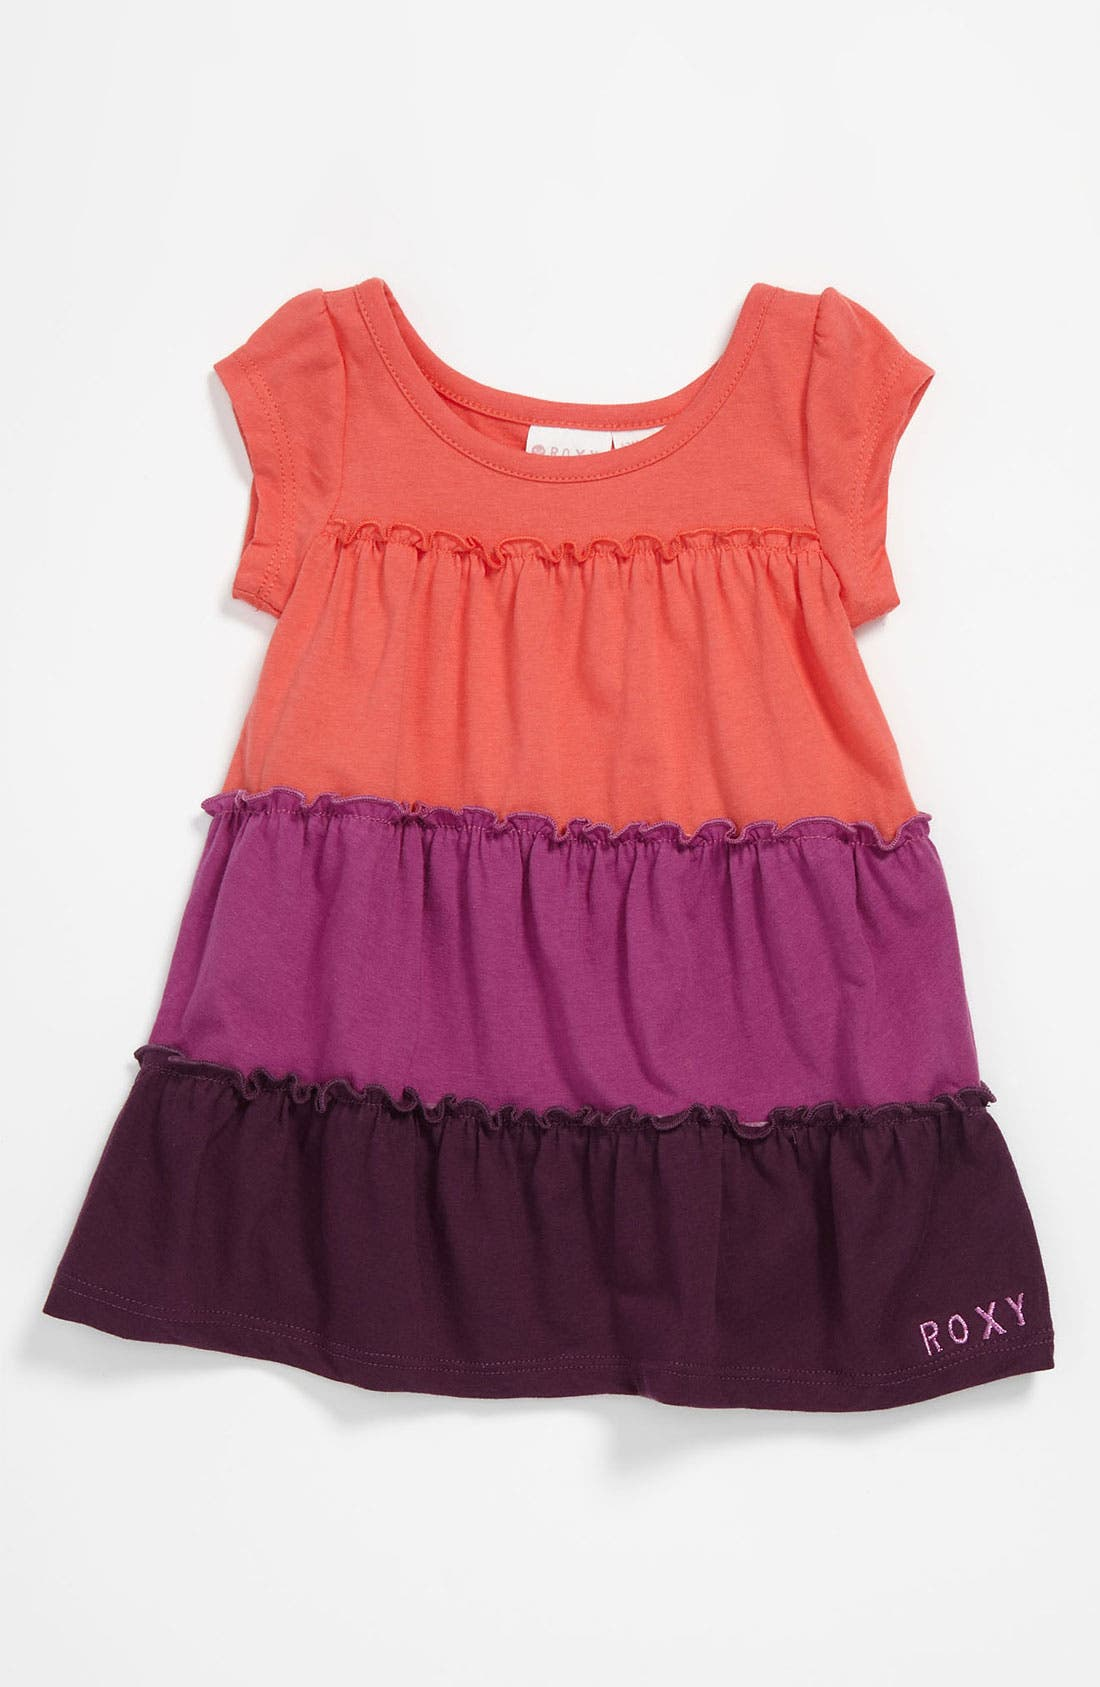 Main Image - 'Cider' Colorblock Dress (Toddler)